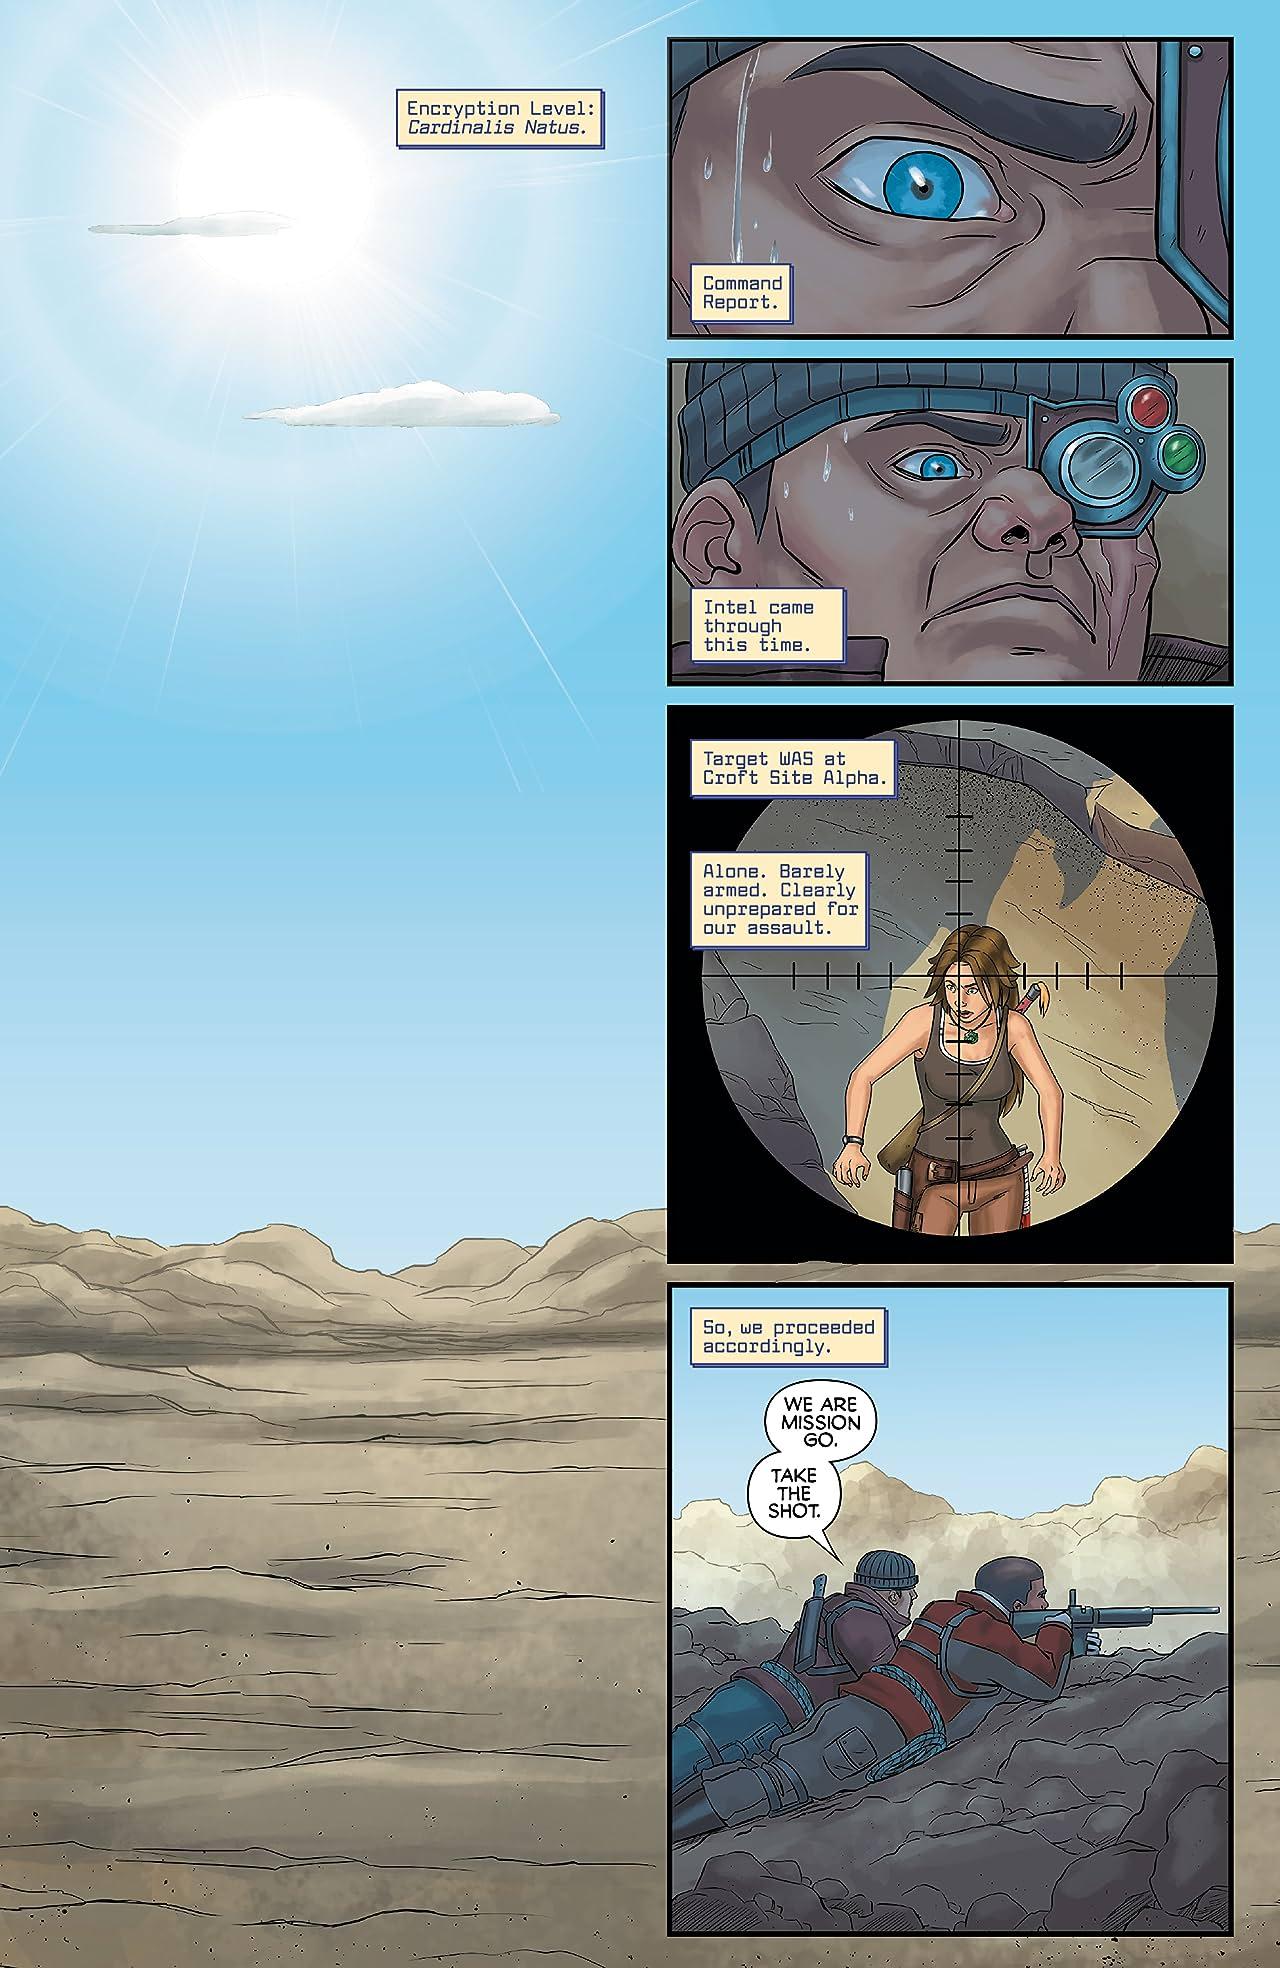 Tomb Raider: Survivor's Crusade #4